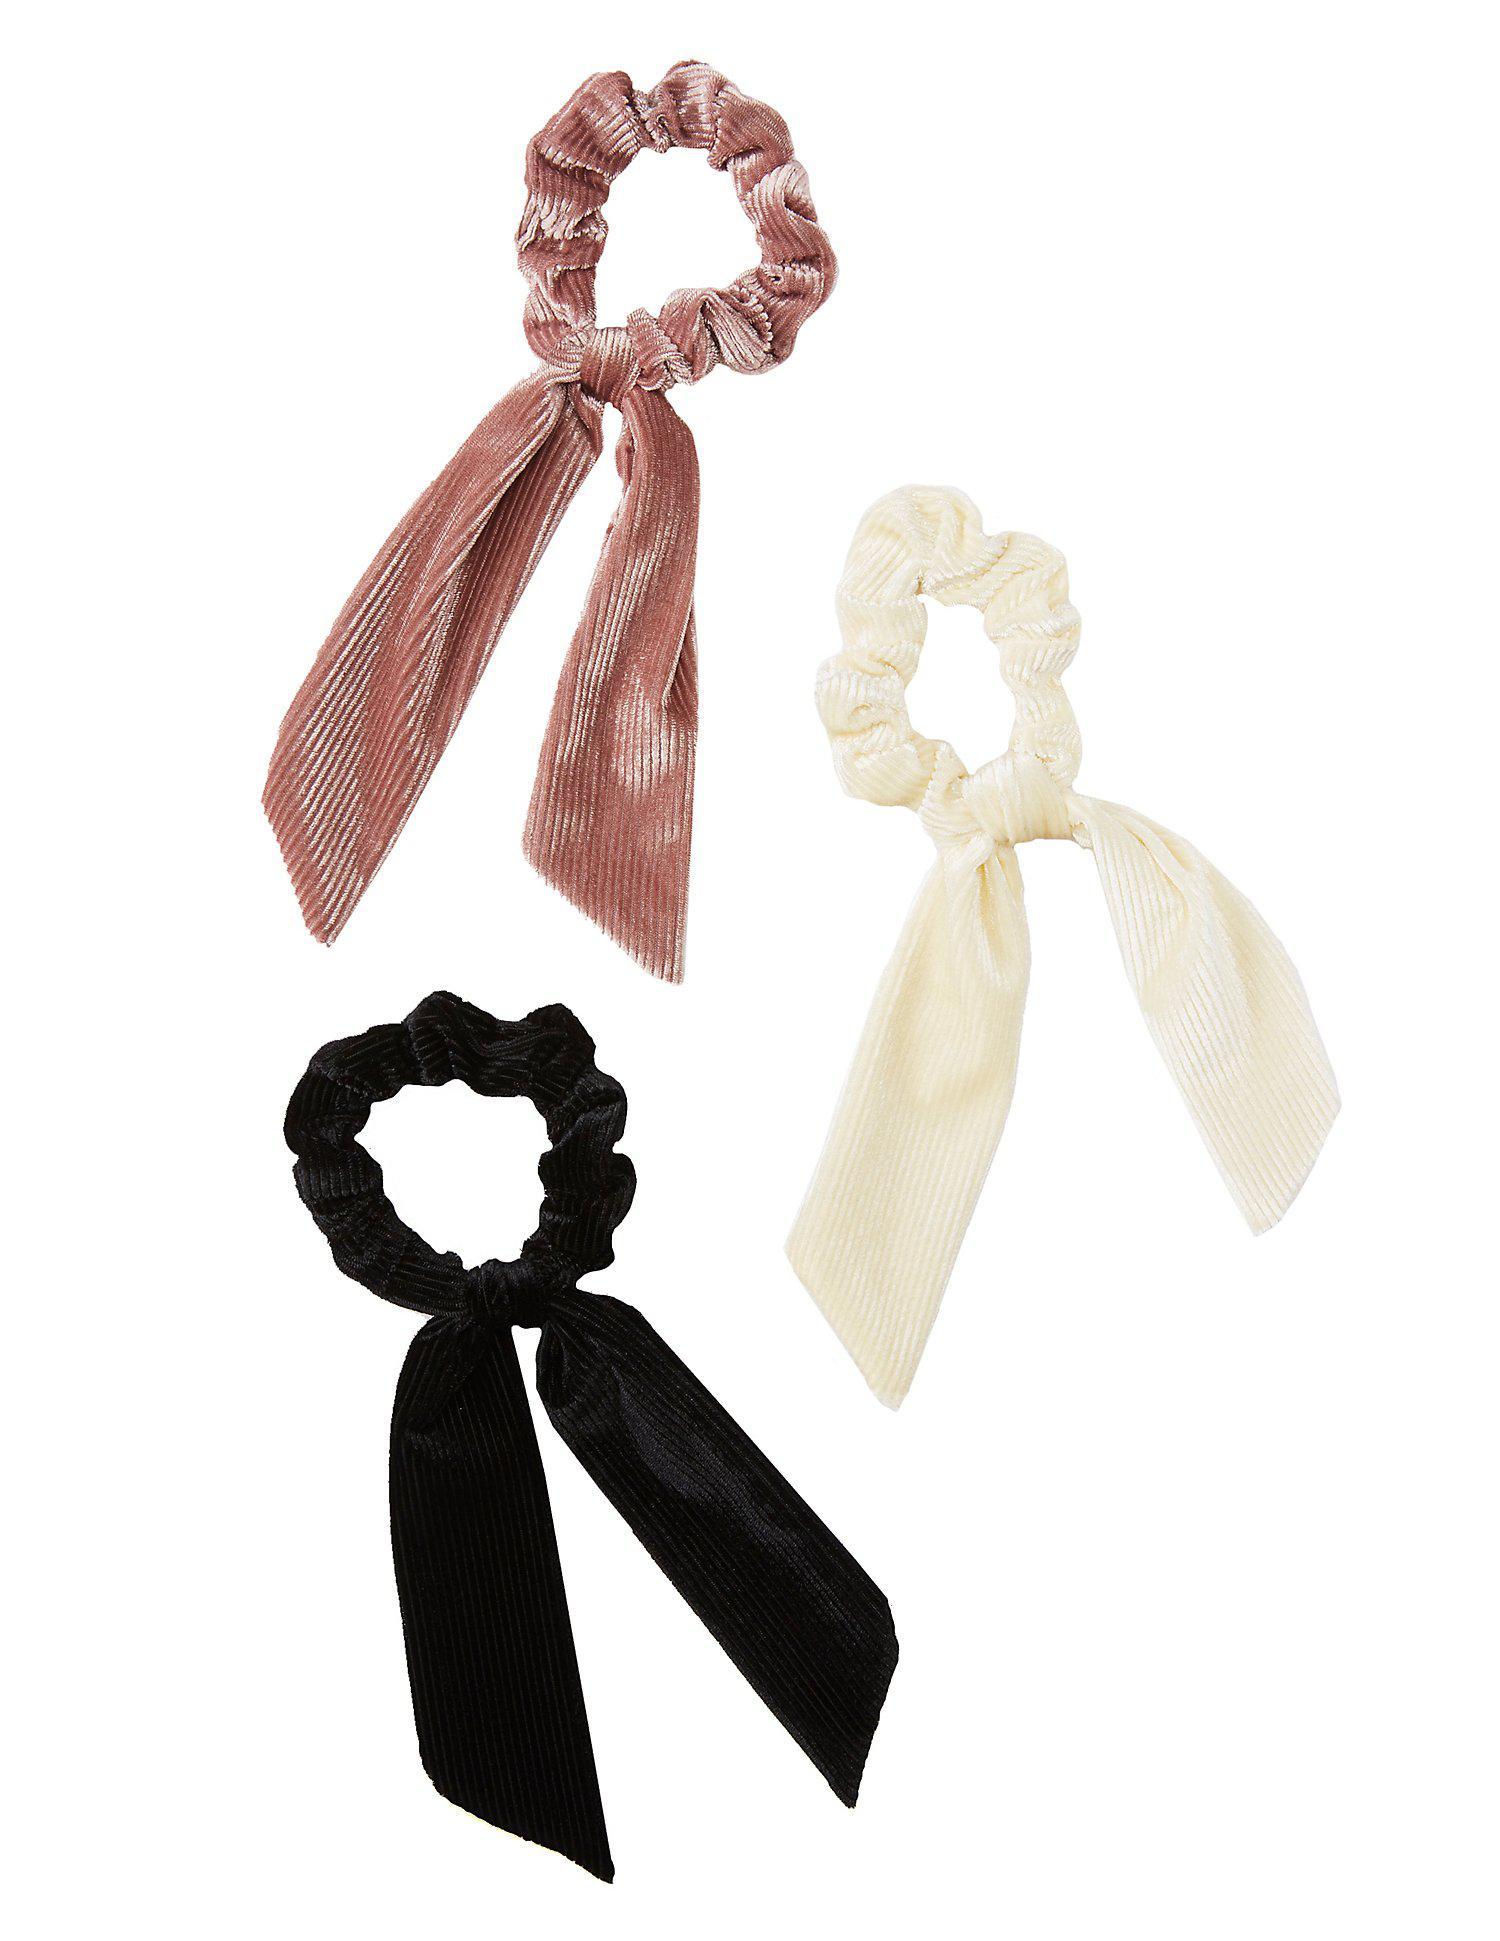 Lyst - Charlotte Russe Corduroy Tie Scrunchies - 3 Pack in Pink d9d3923389f